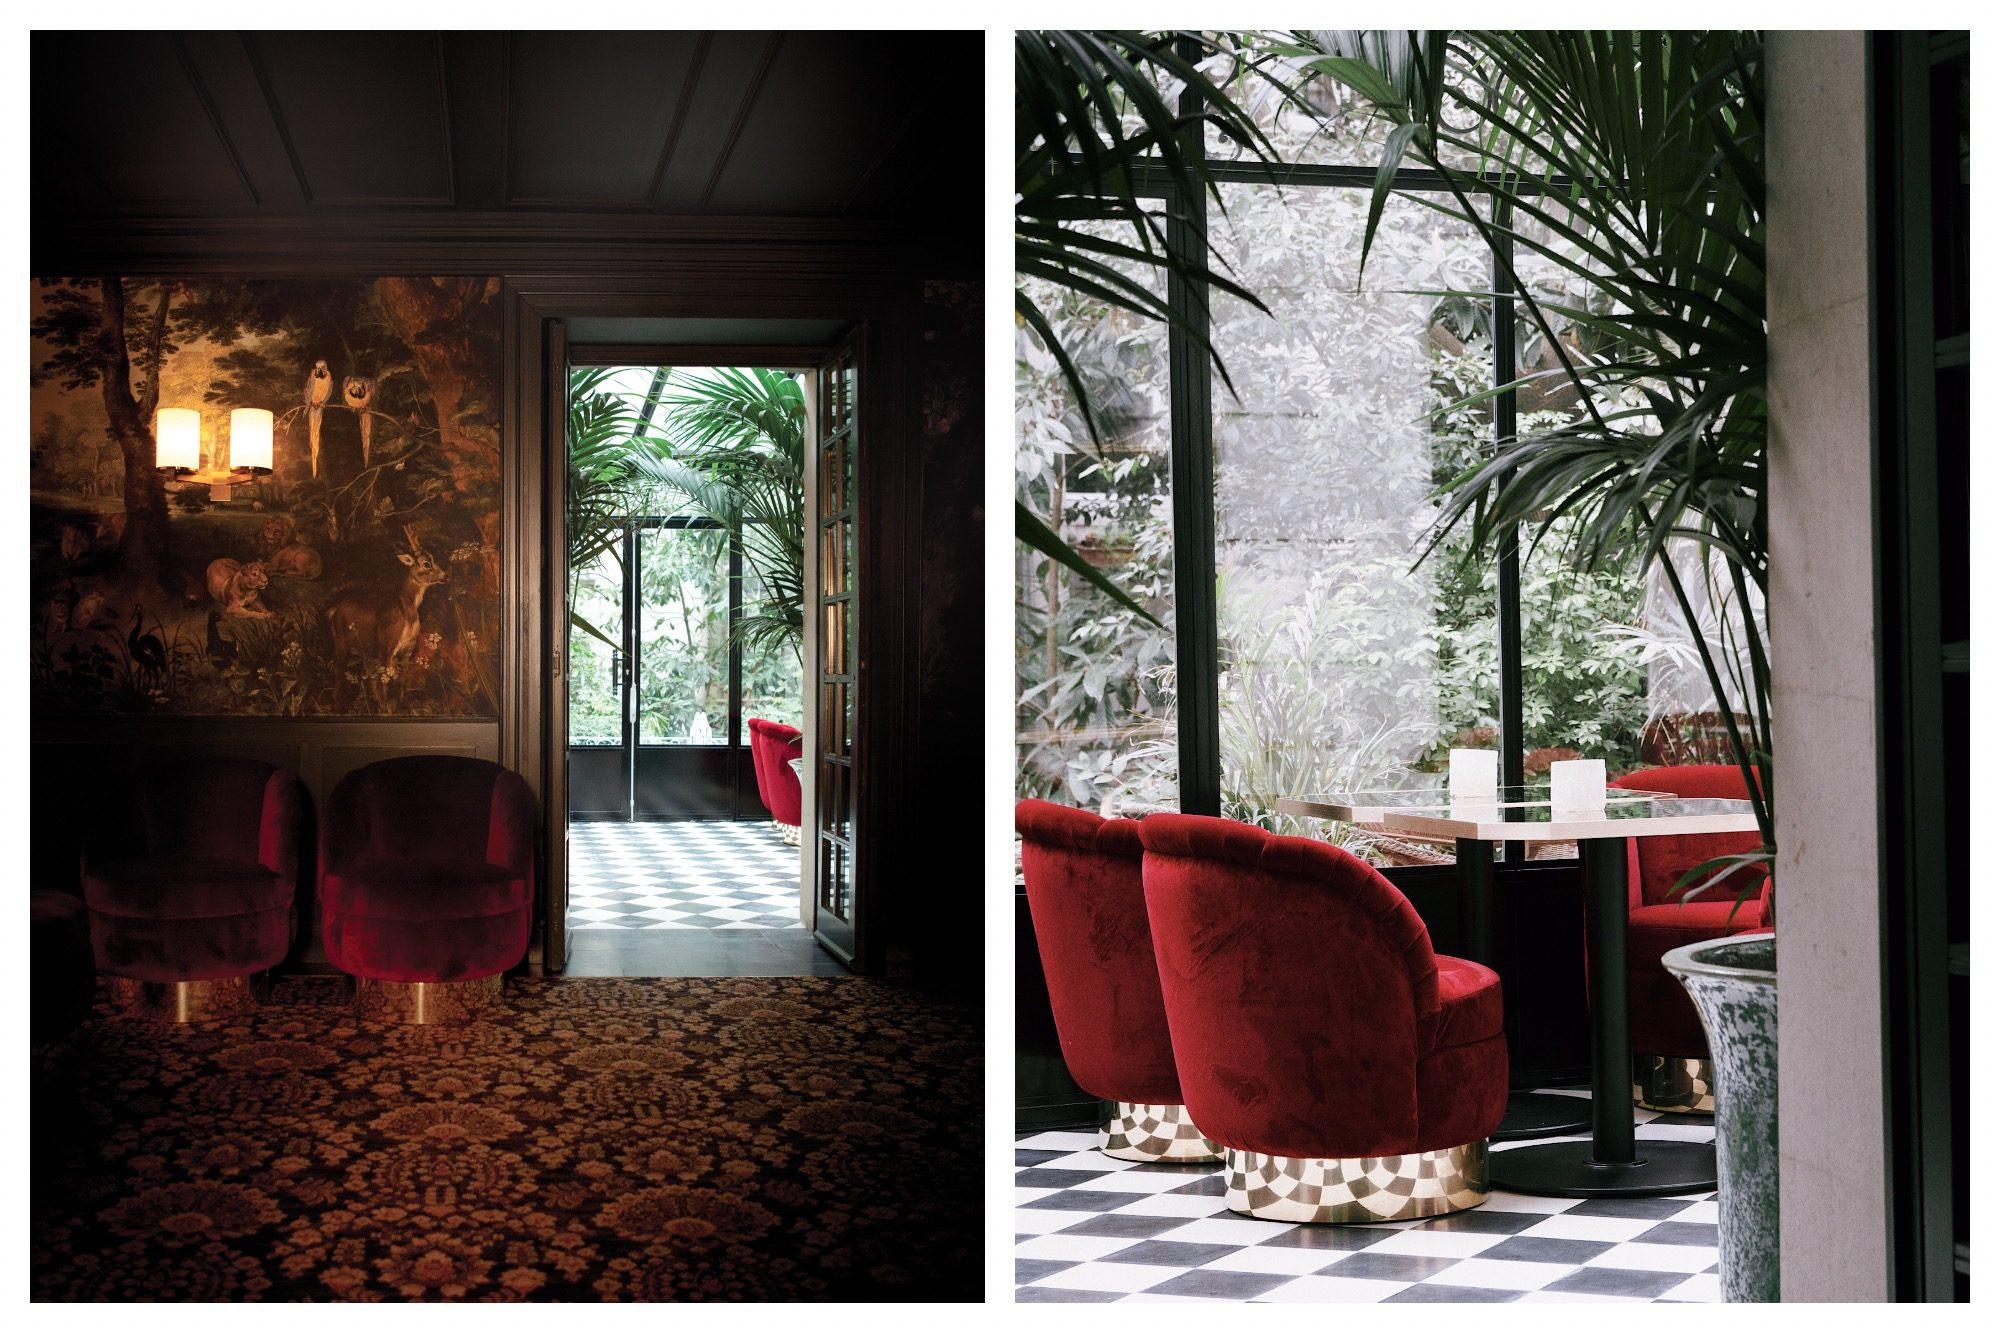 The moodily lit Très Particulier bar in Montmartre is a favorite hidden spot in Paris.